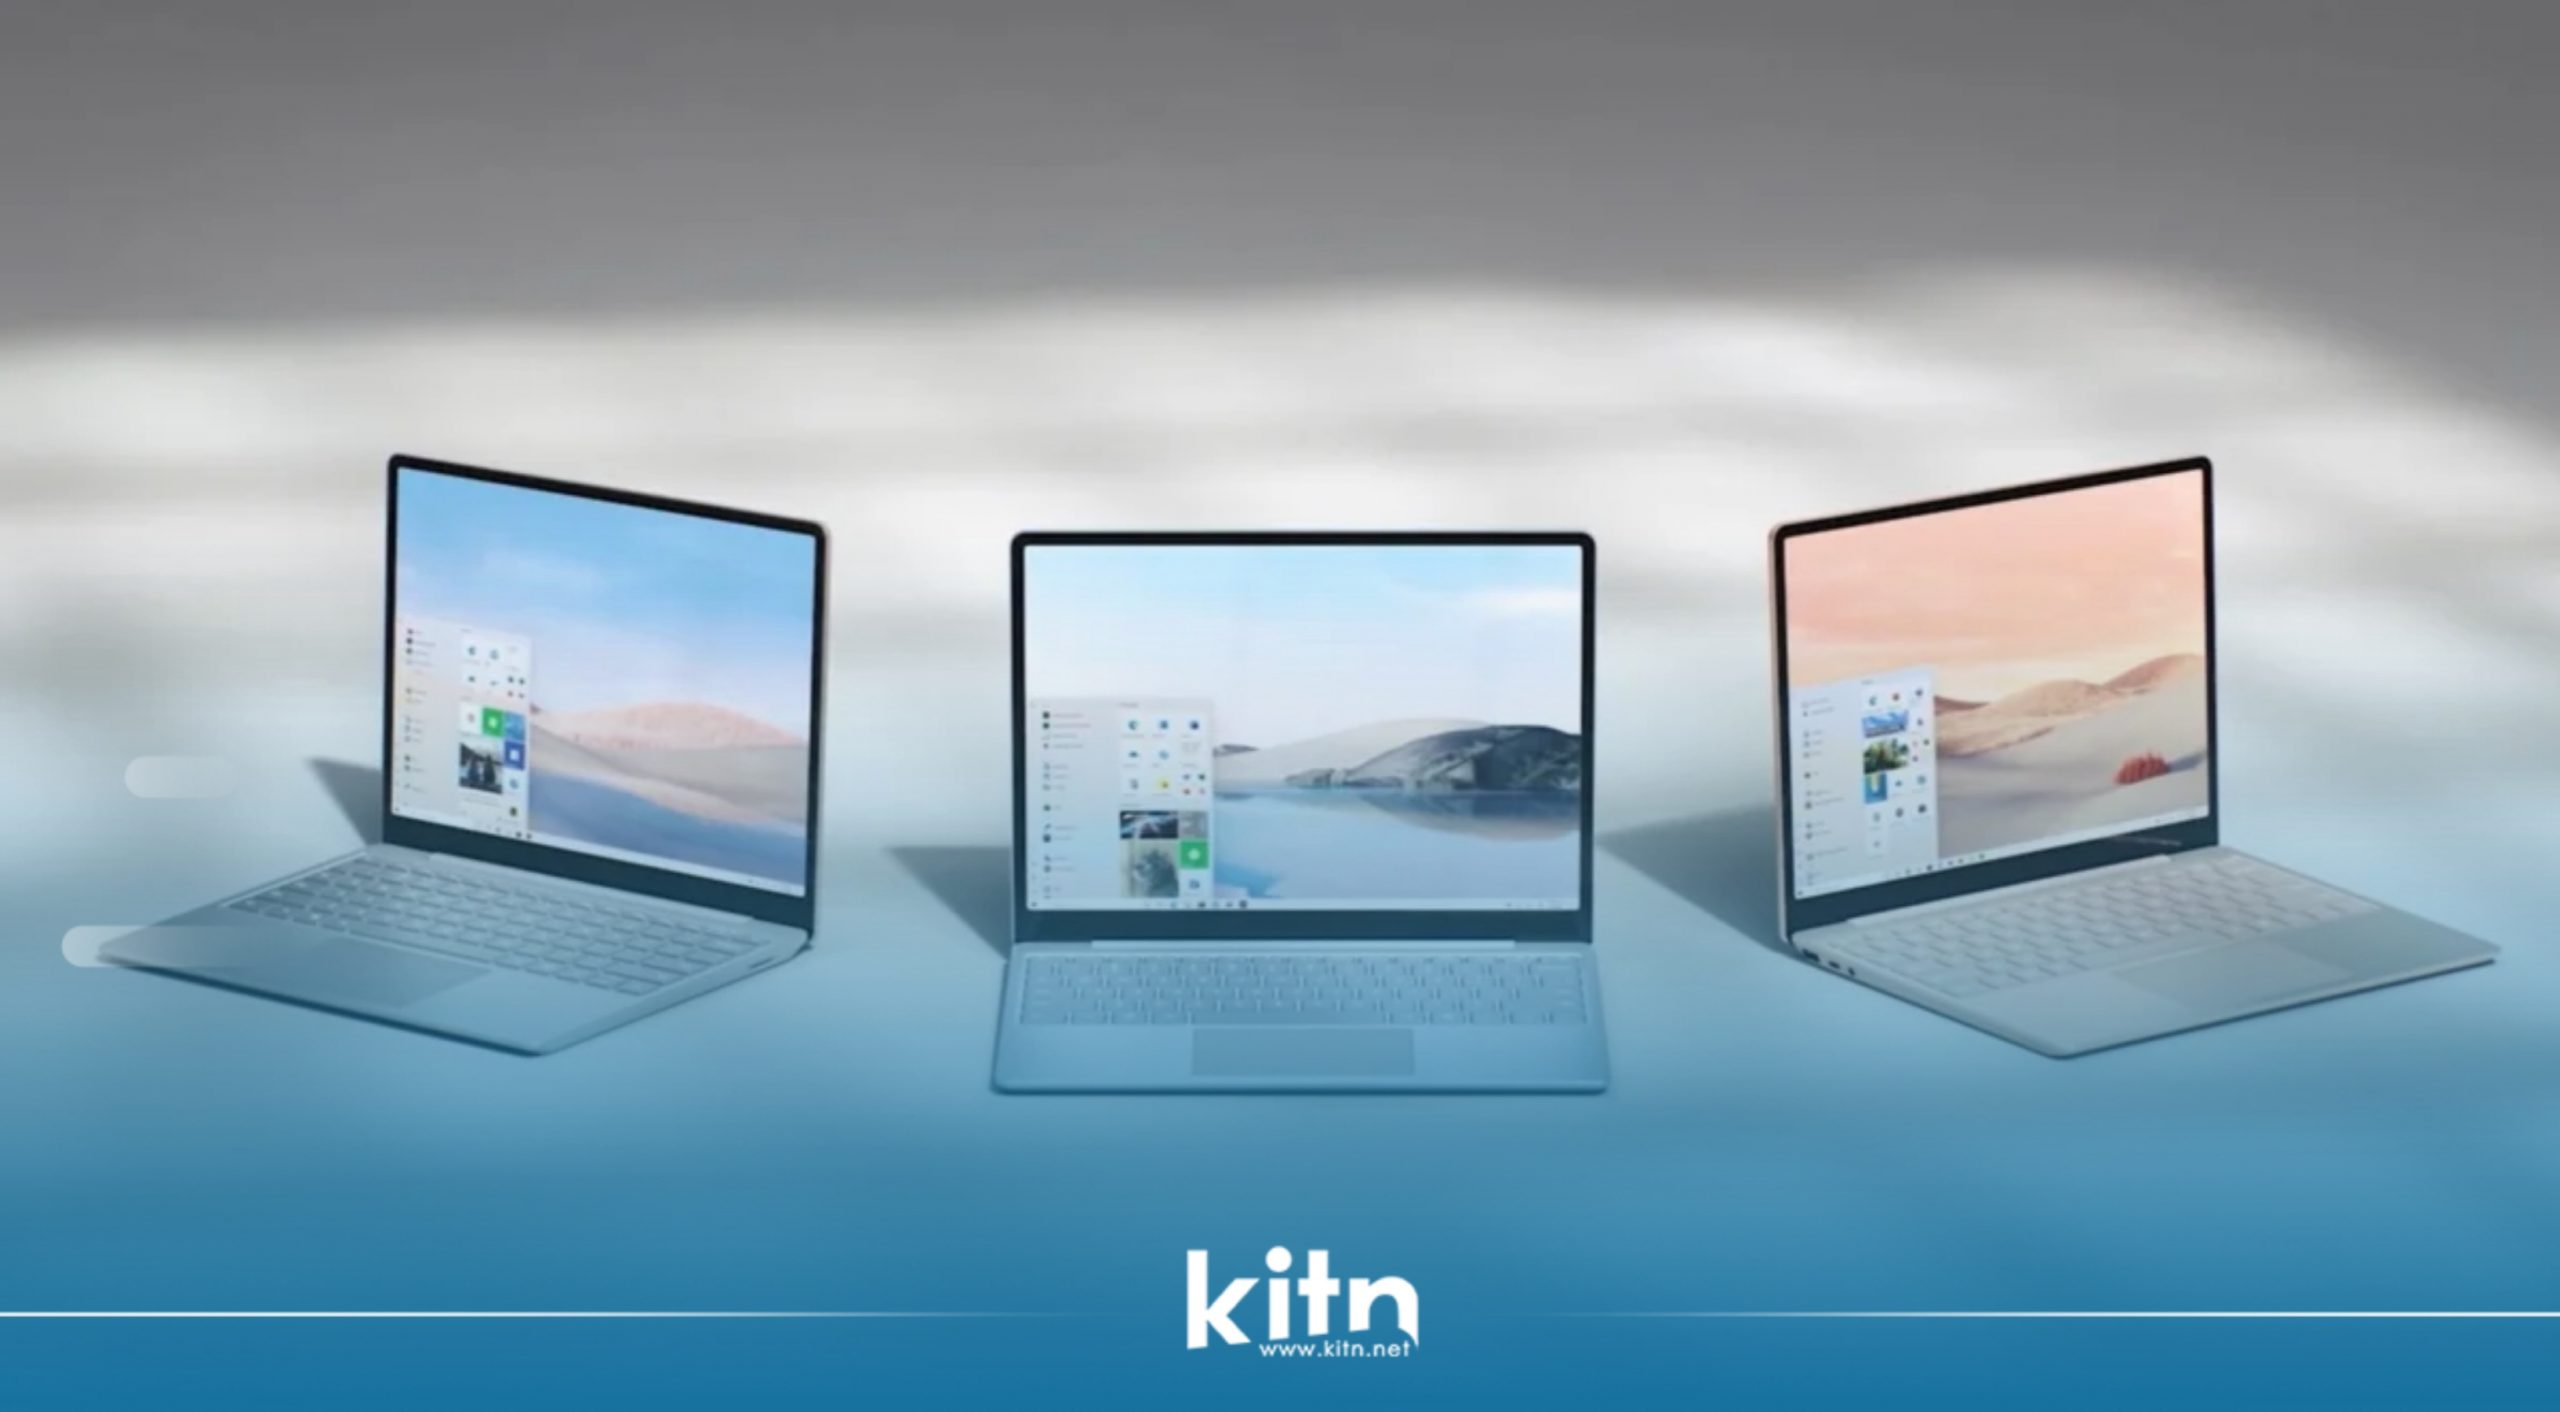 بە فەرمی مایکرۆسۆفت لاپتۆپی Microsoft Surface Go بە نرخێکی هەرزان و تایبەتمەندی گونجاوەوە ڕاگەیاند